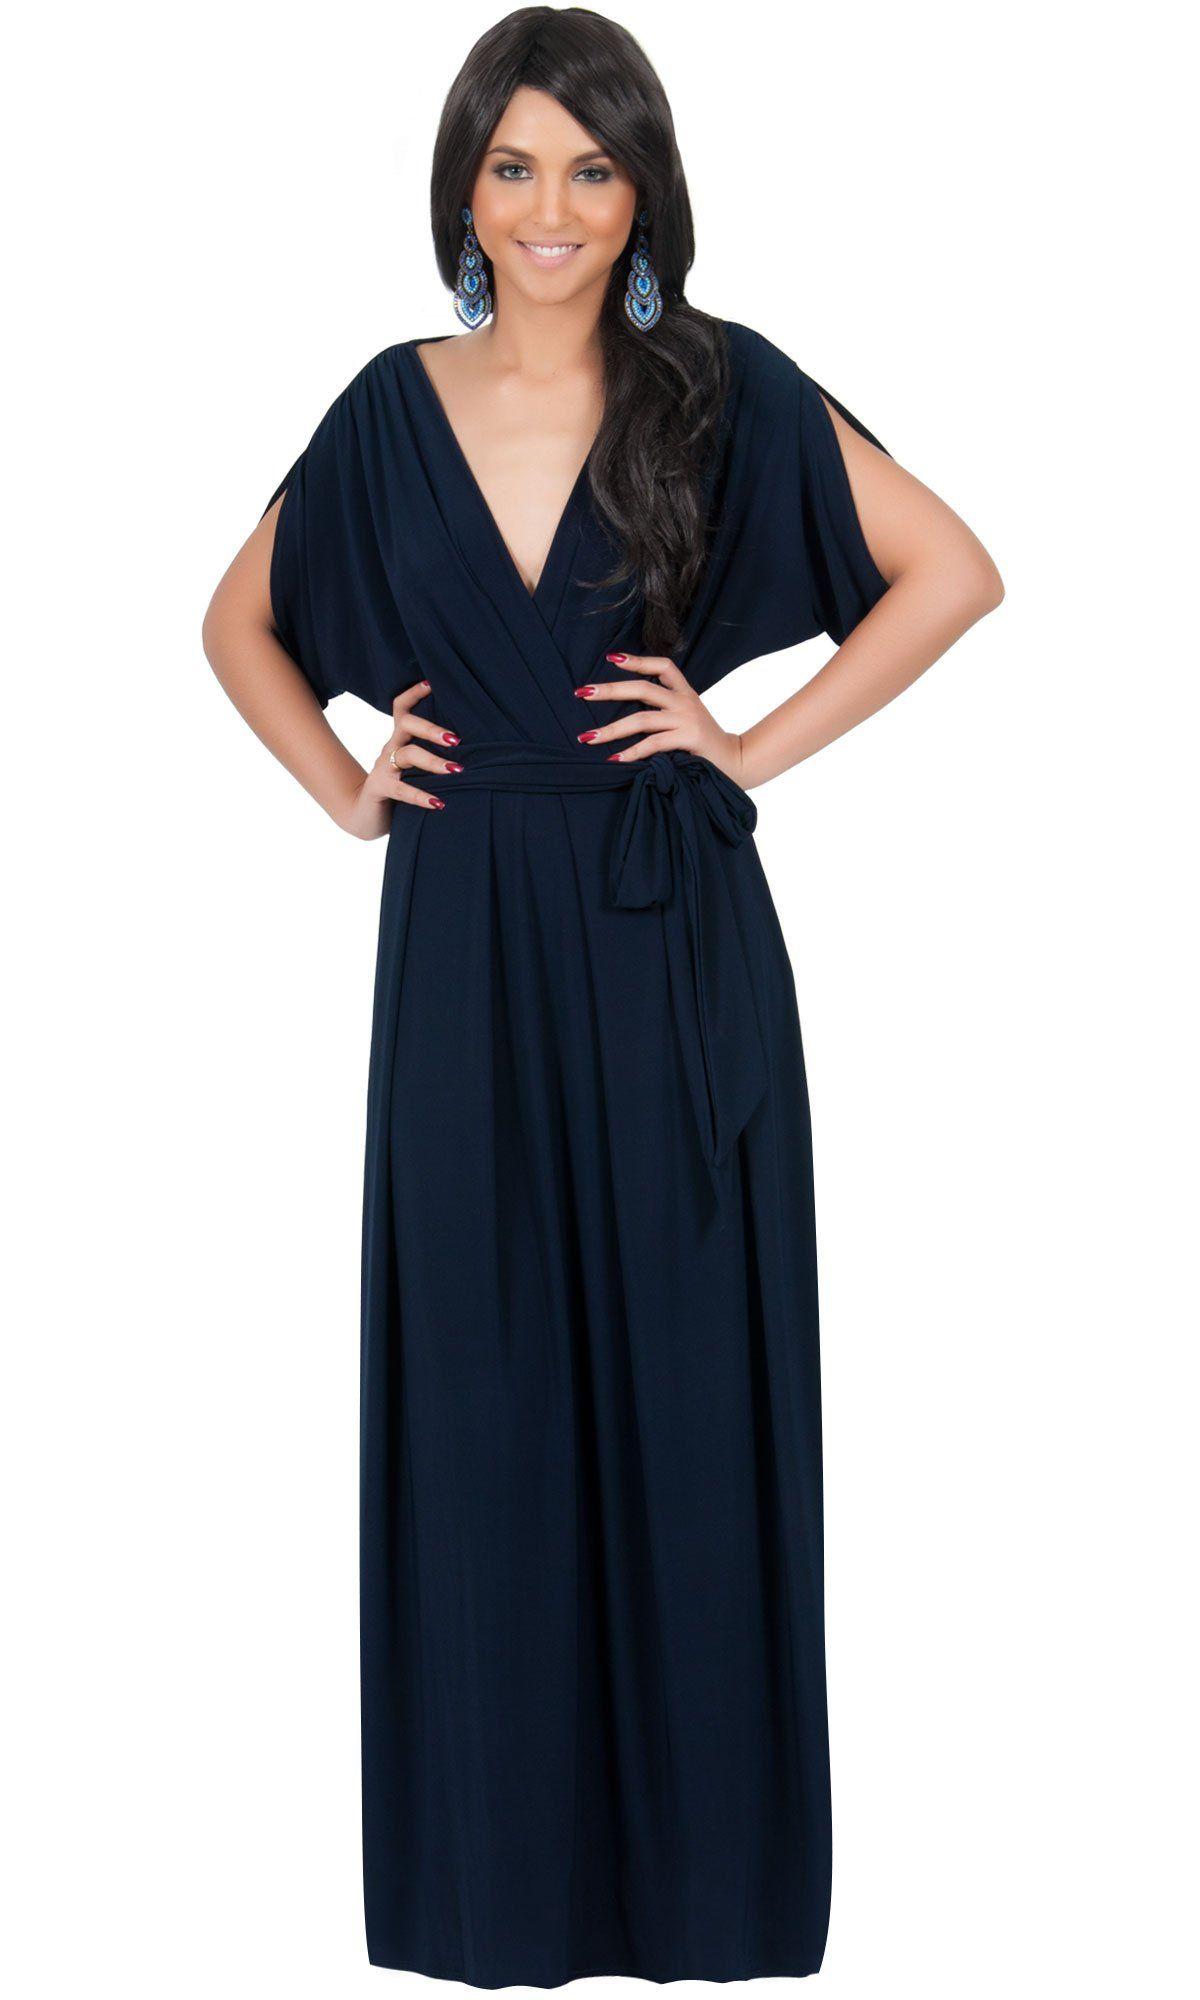 d065726e9b64b Koh Koh Women's Batwing Dolman Sleeve Maxi Dress at Amazon Women's Clothing  store: